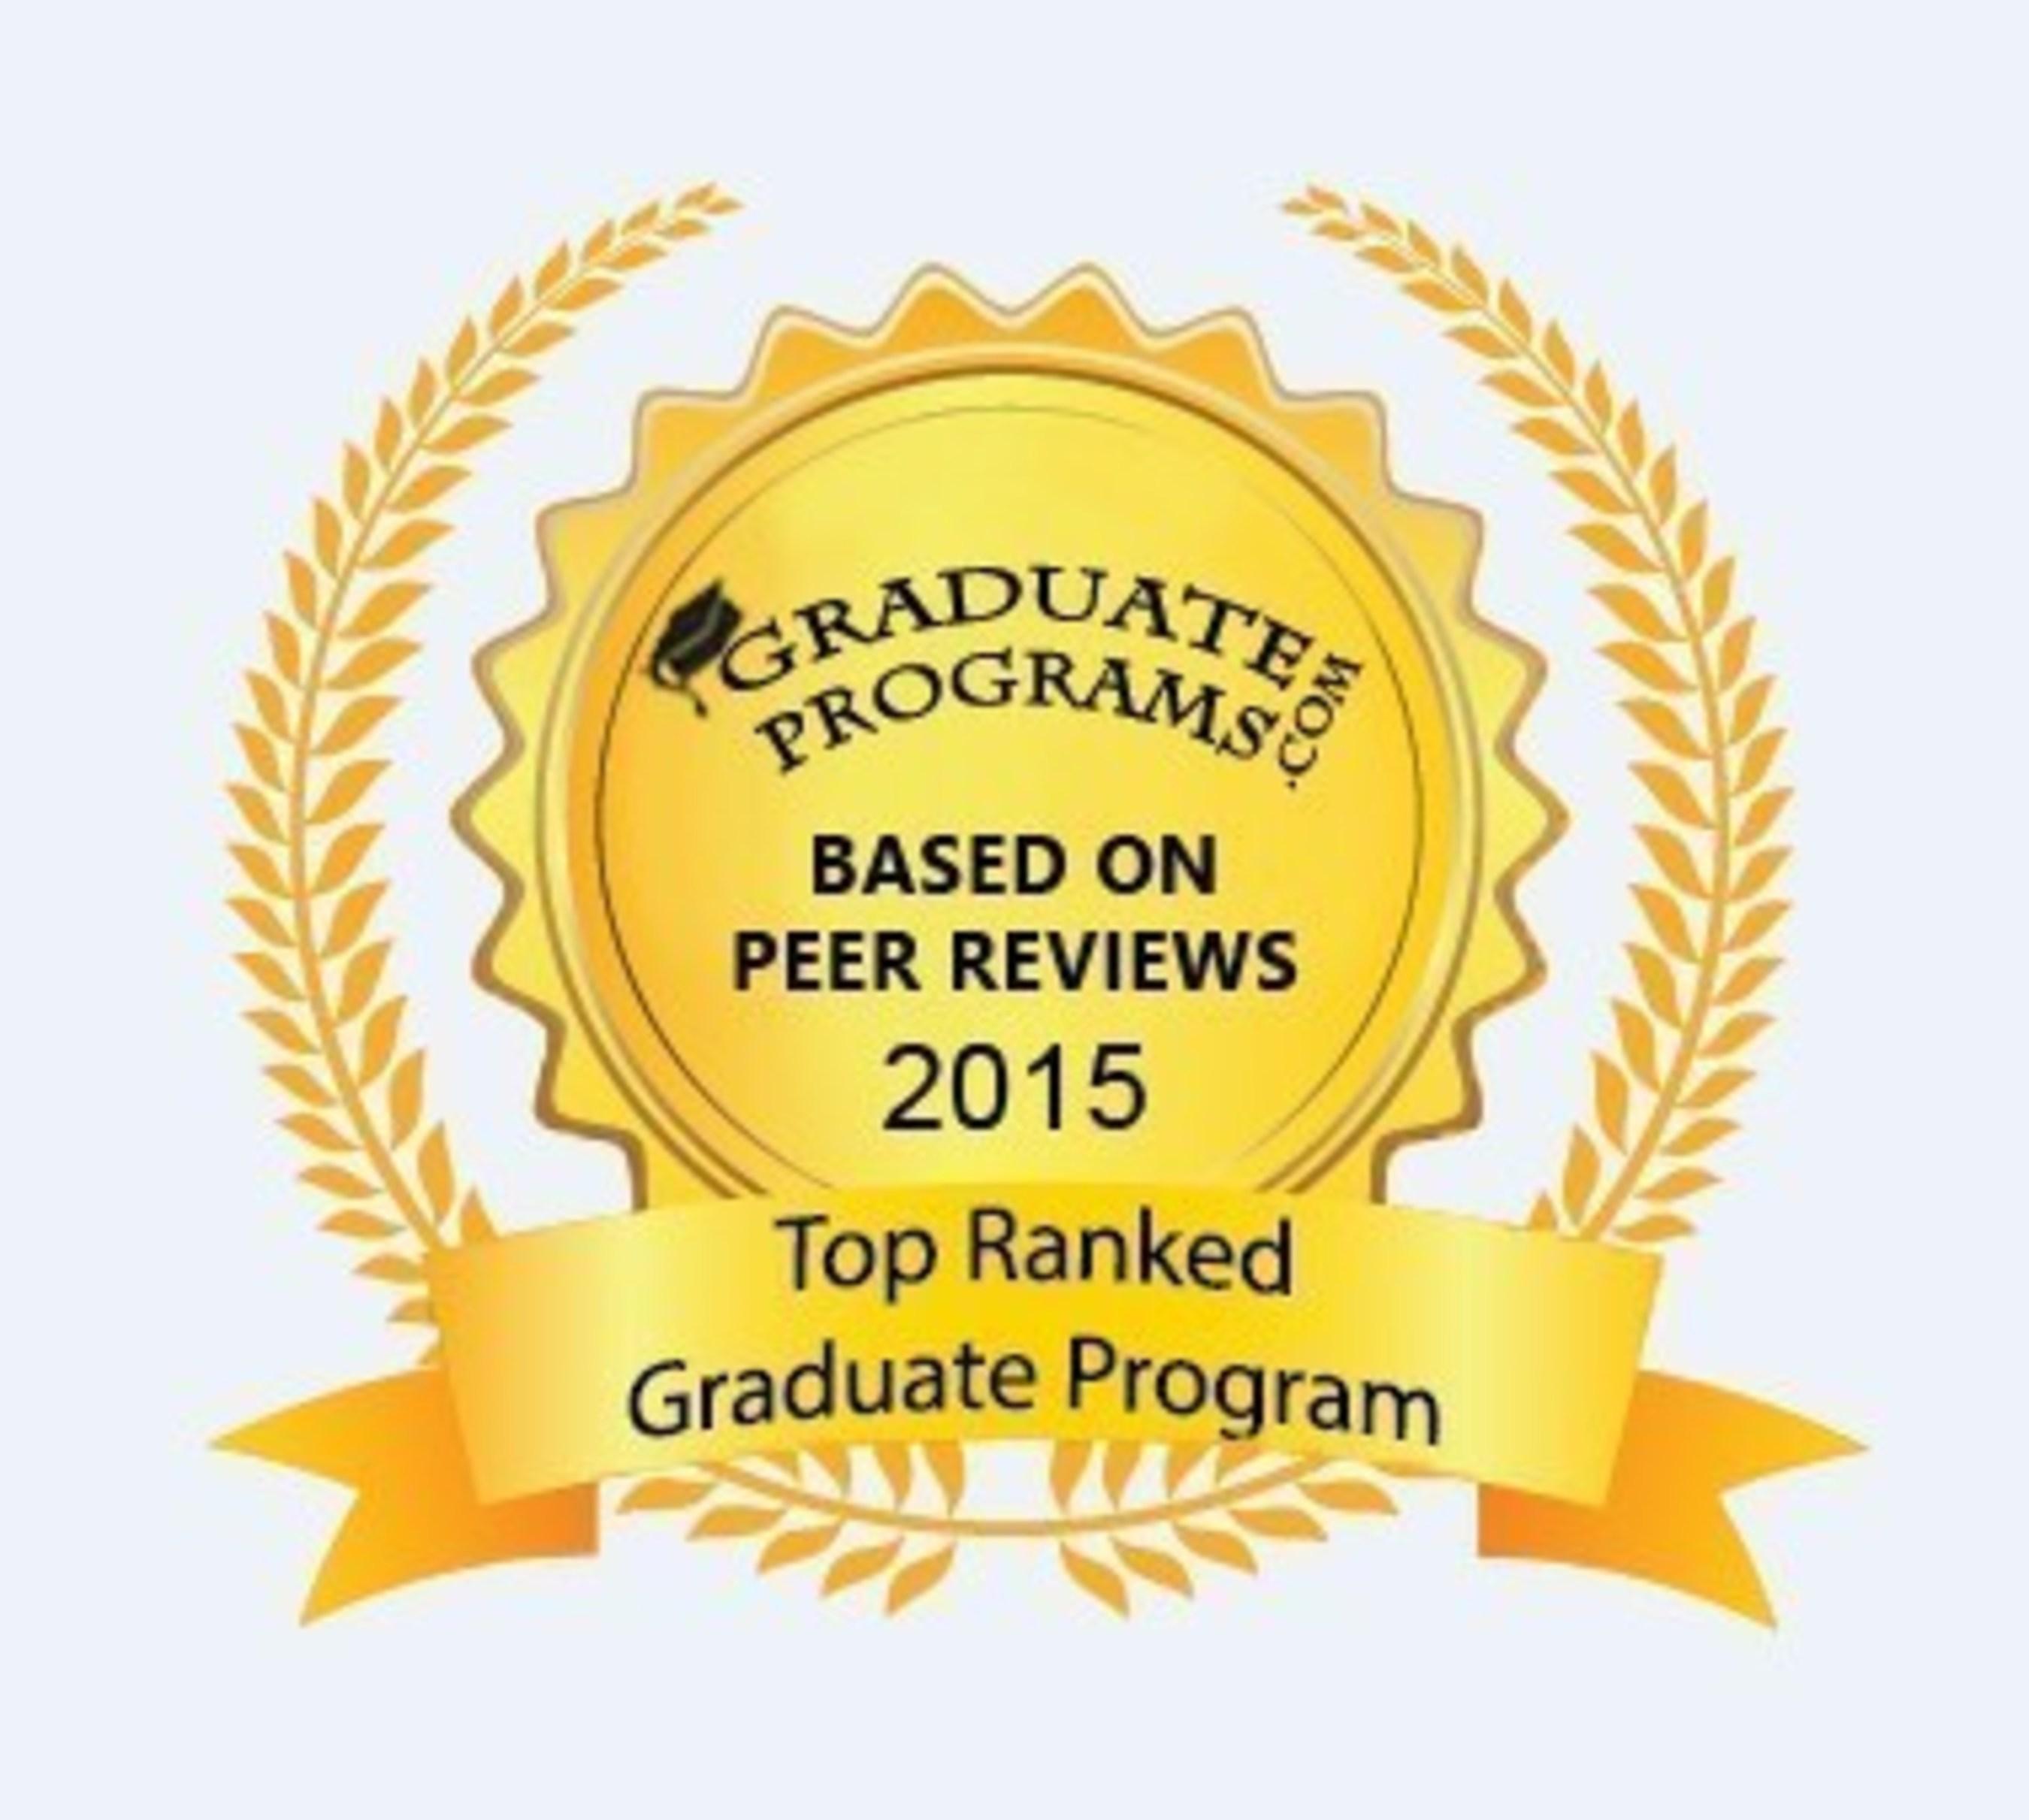 Graduateprograms.com Announces Top Online Graduate Program Rankings